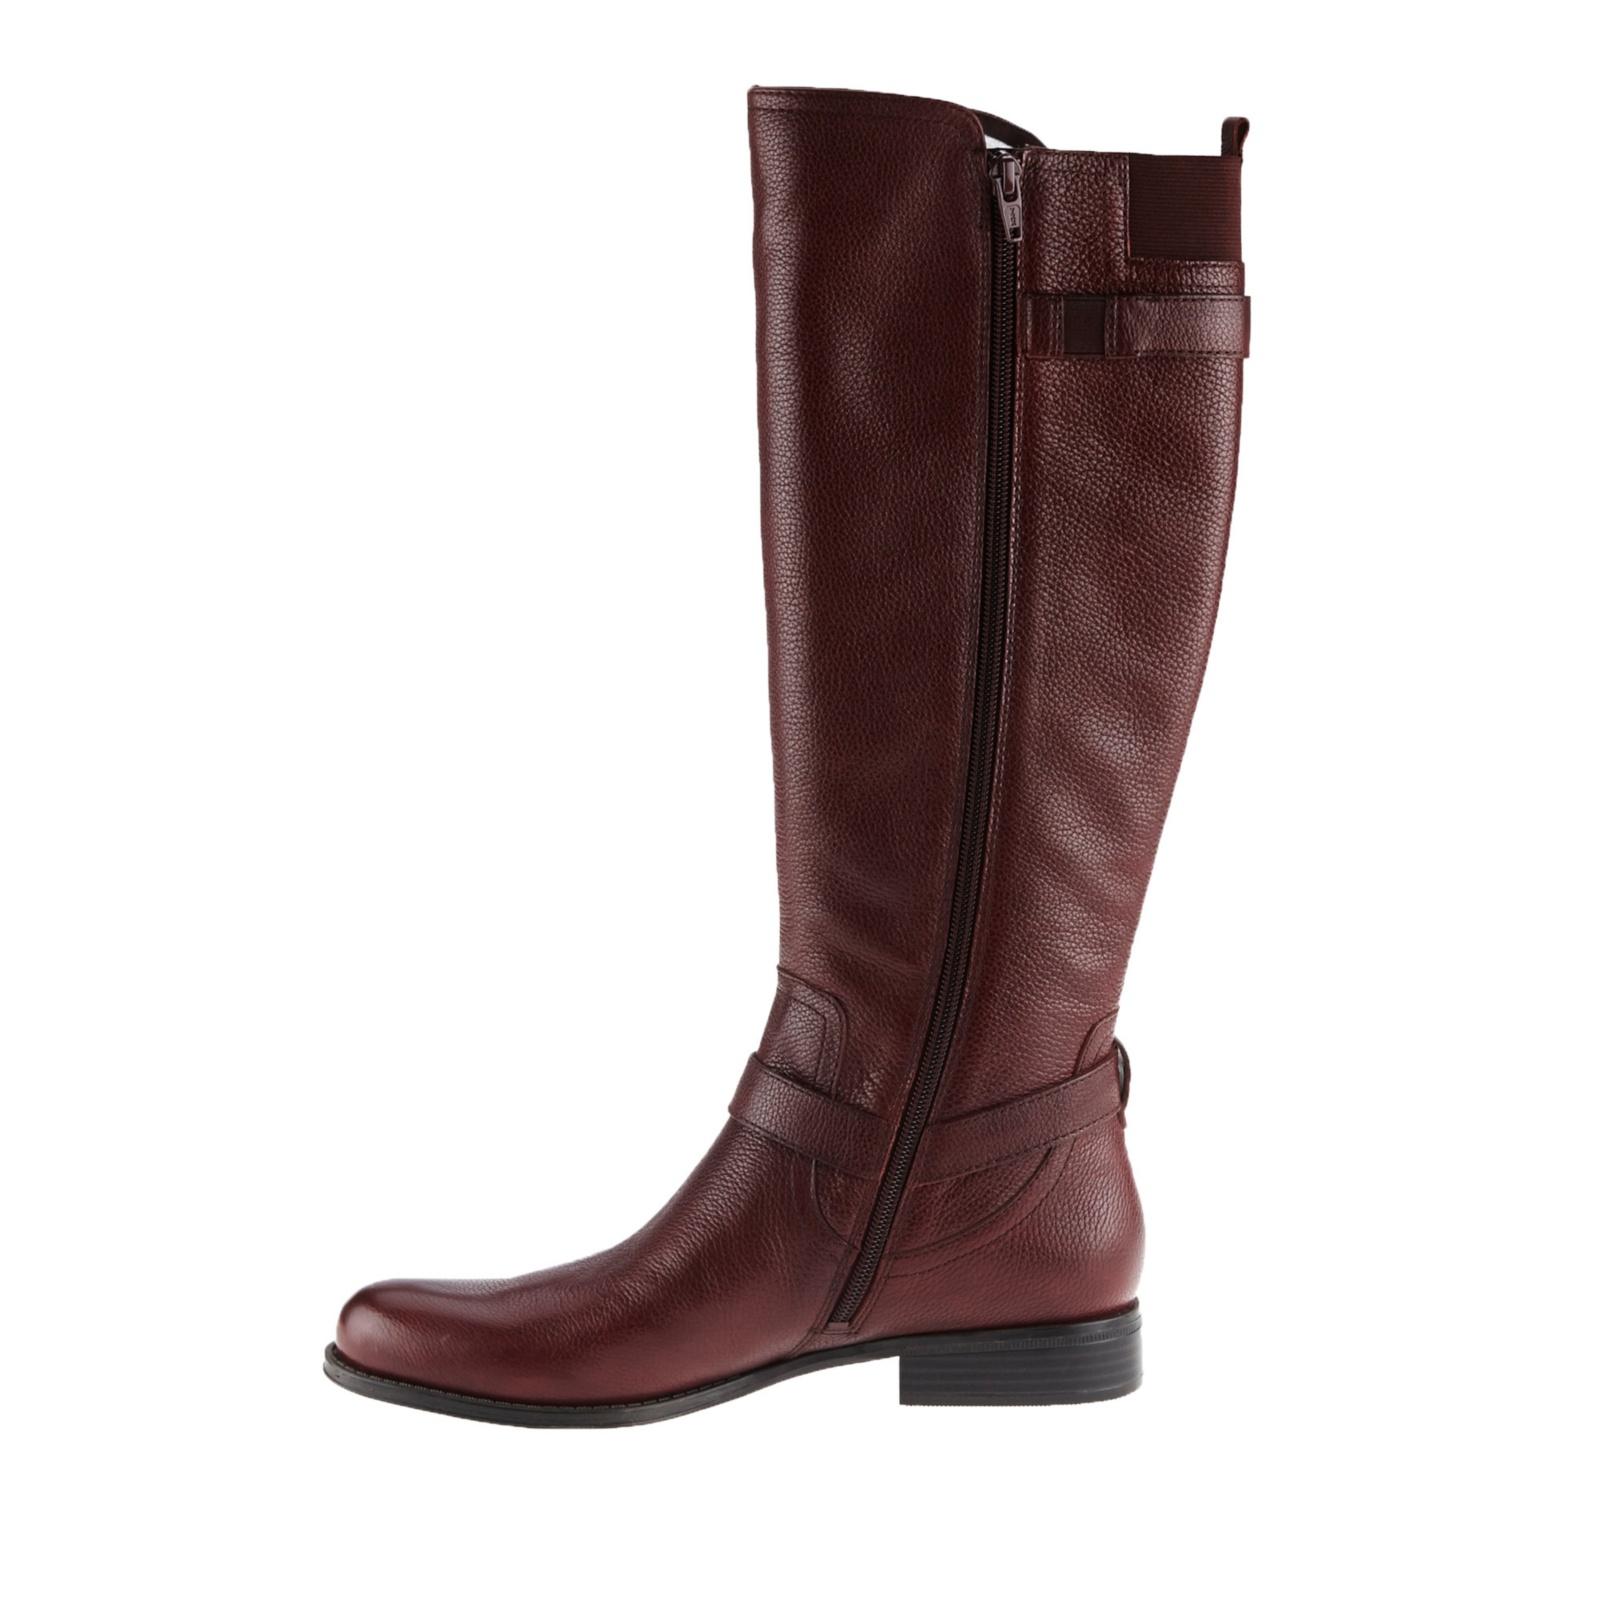 naturalizer joan boots ebay